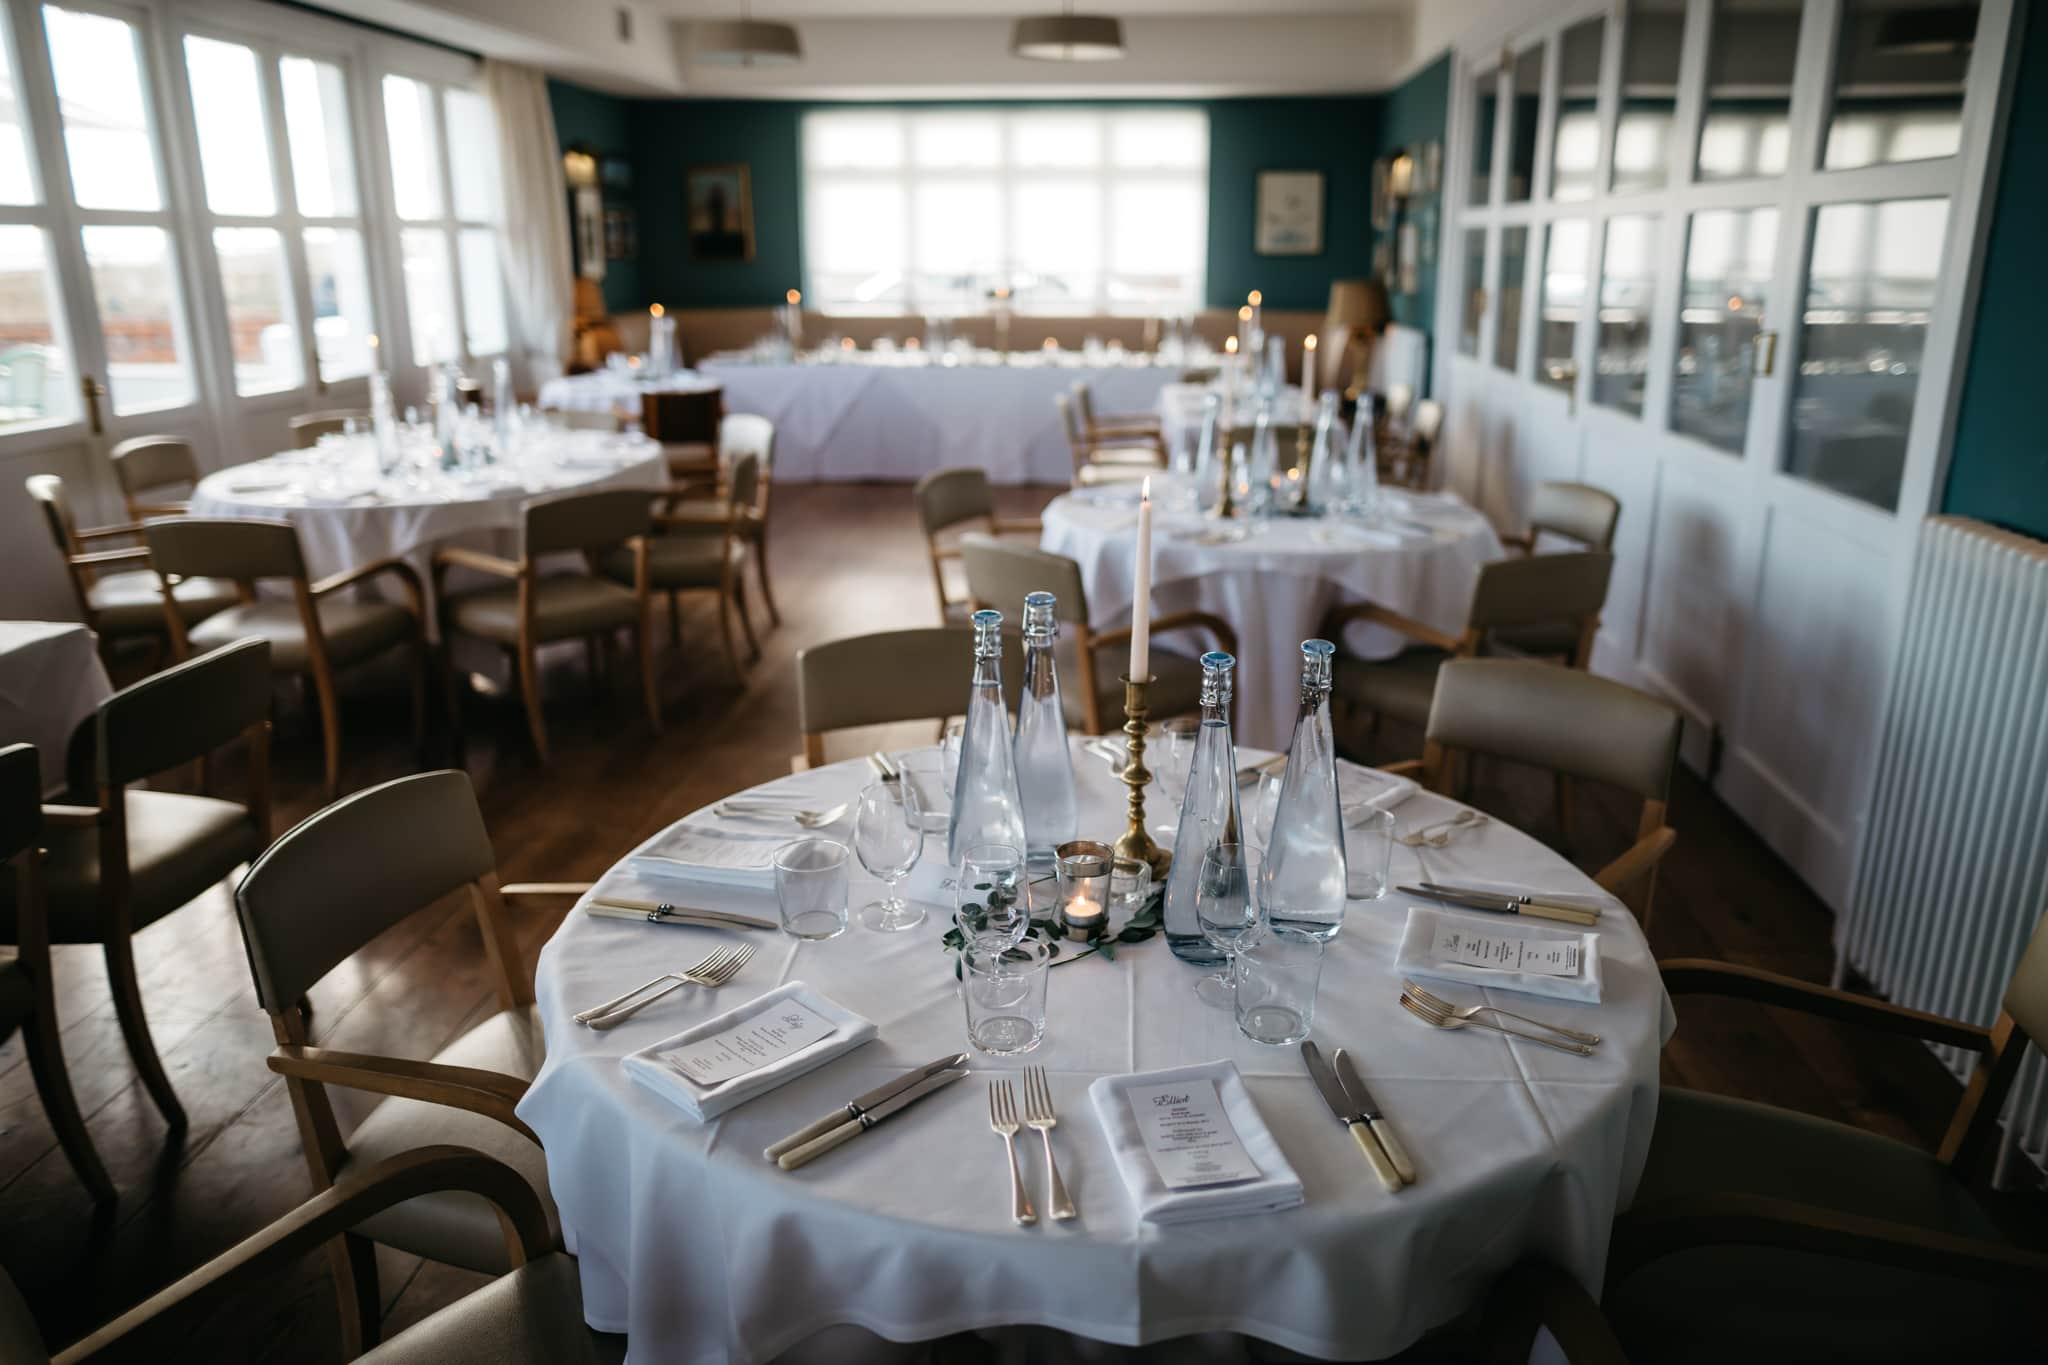 Details of wedding breakfast at Seaside Boarding House